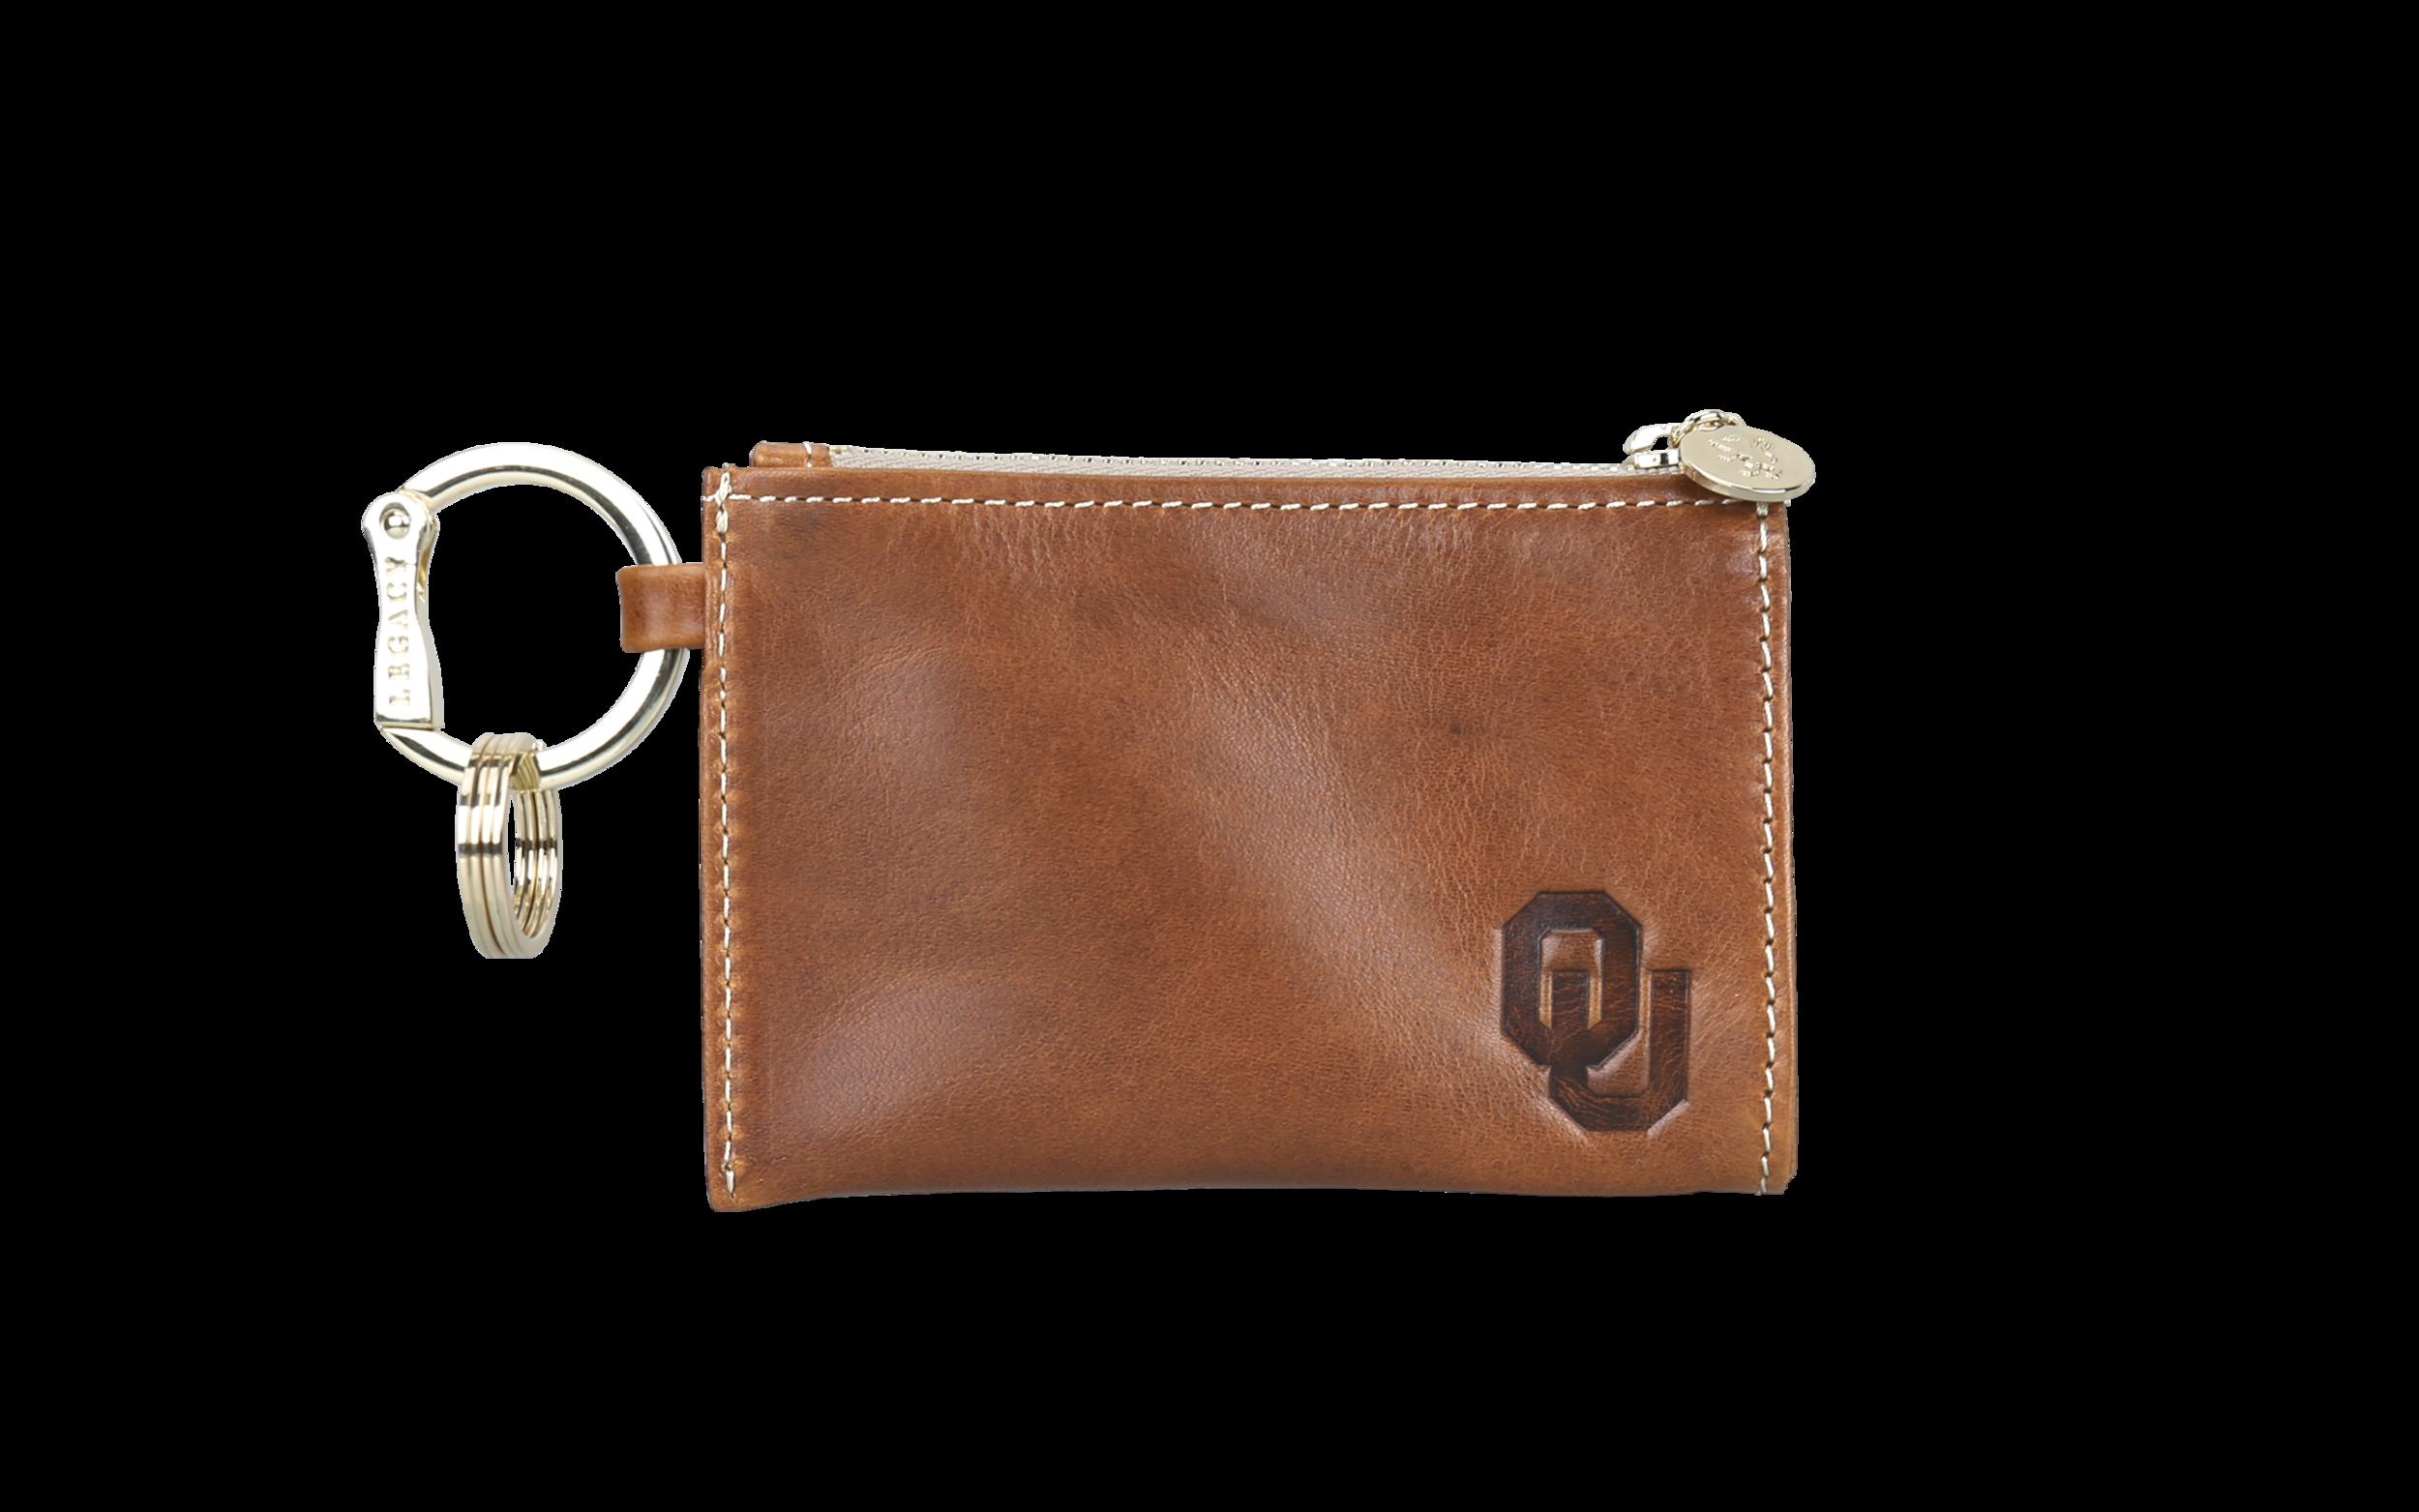 ou ladies wallet.png